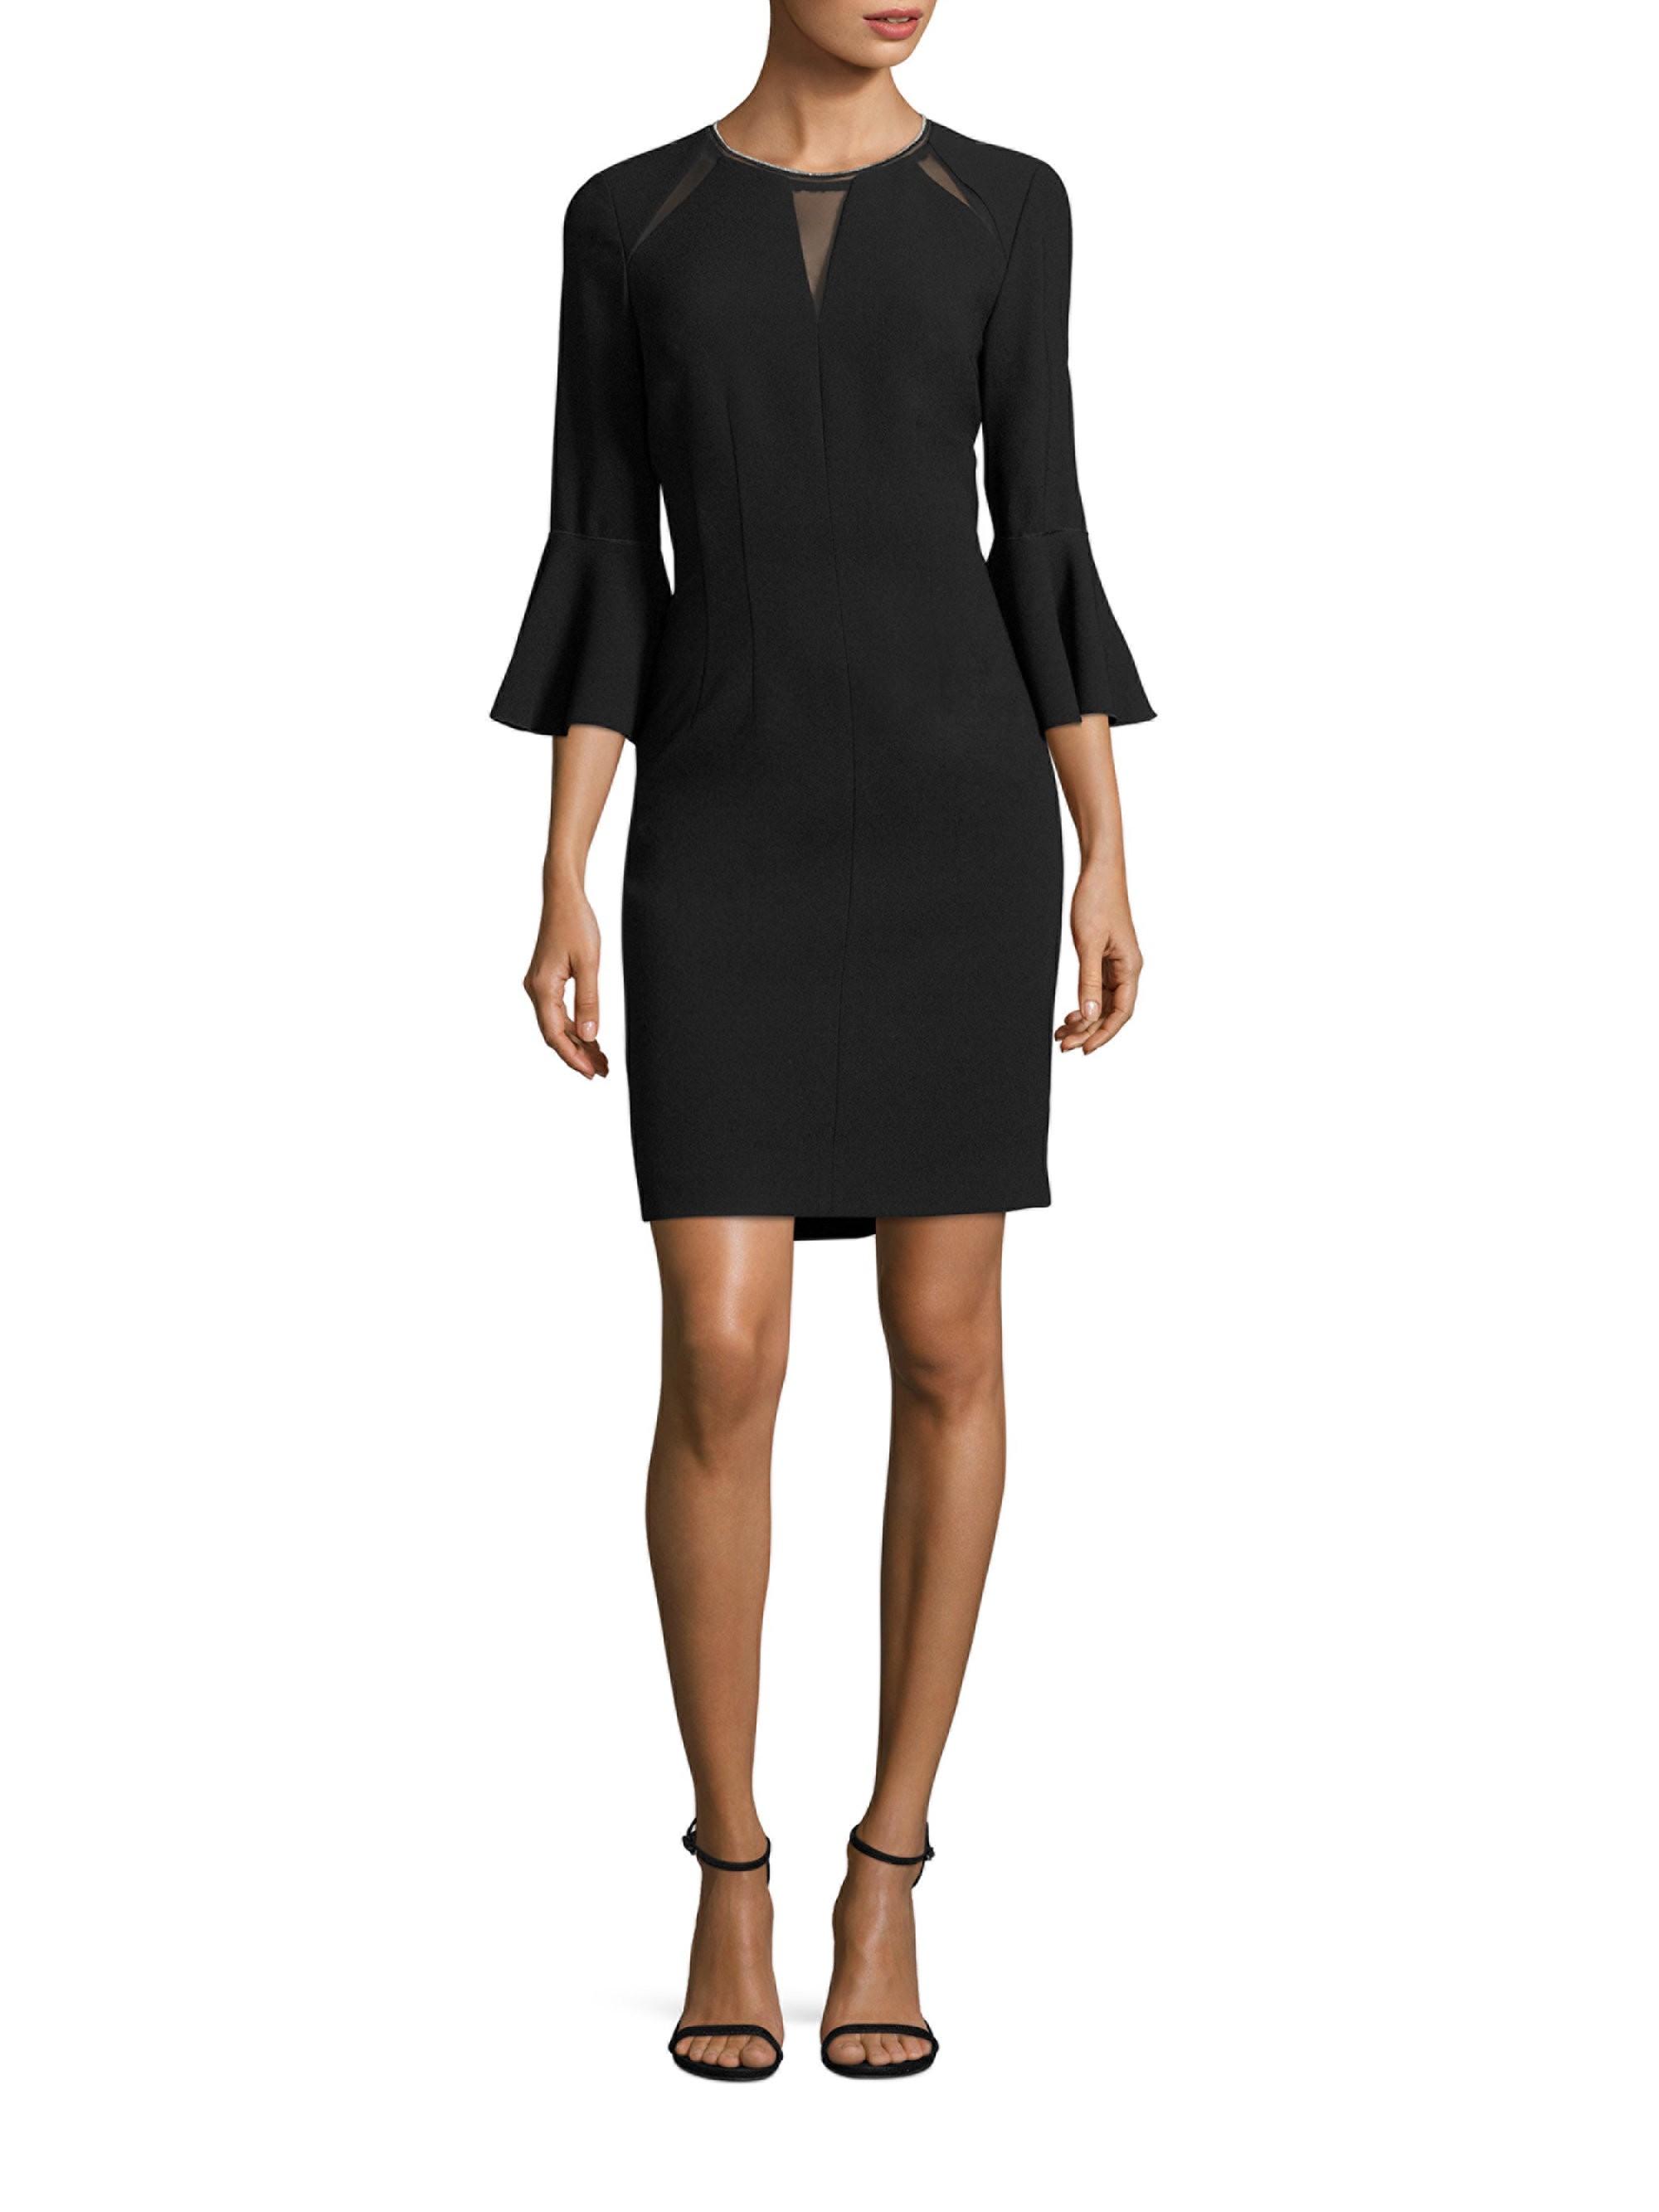 1f7e2a84 Elie Tahari Garcia Bell-Sleeve Embellished Sheath Dress - Black 6